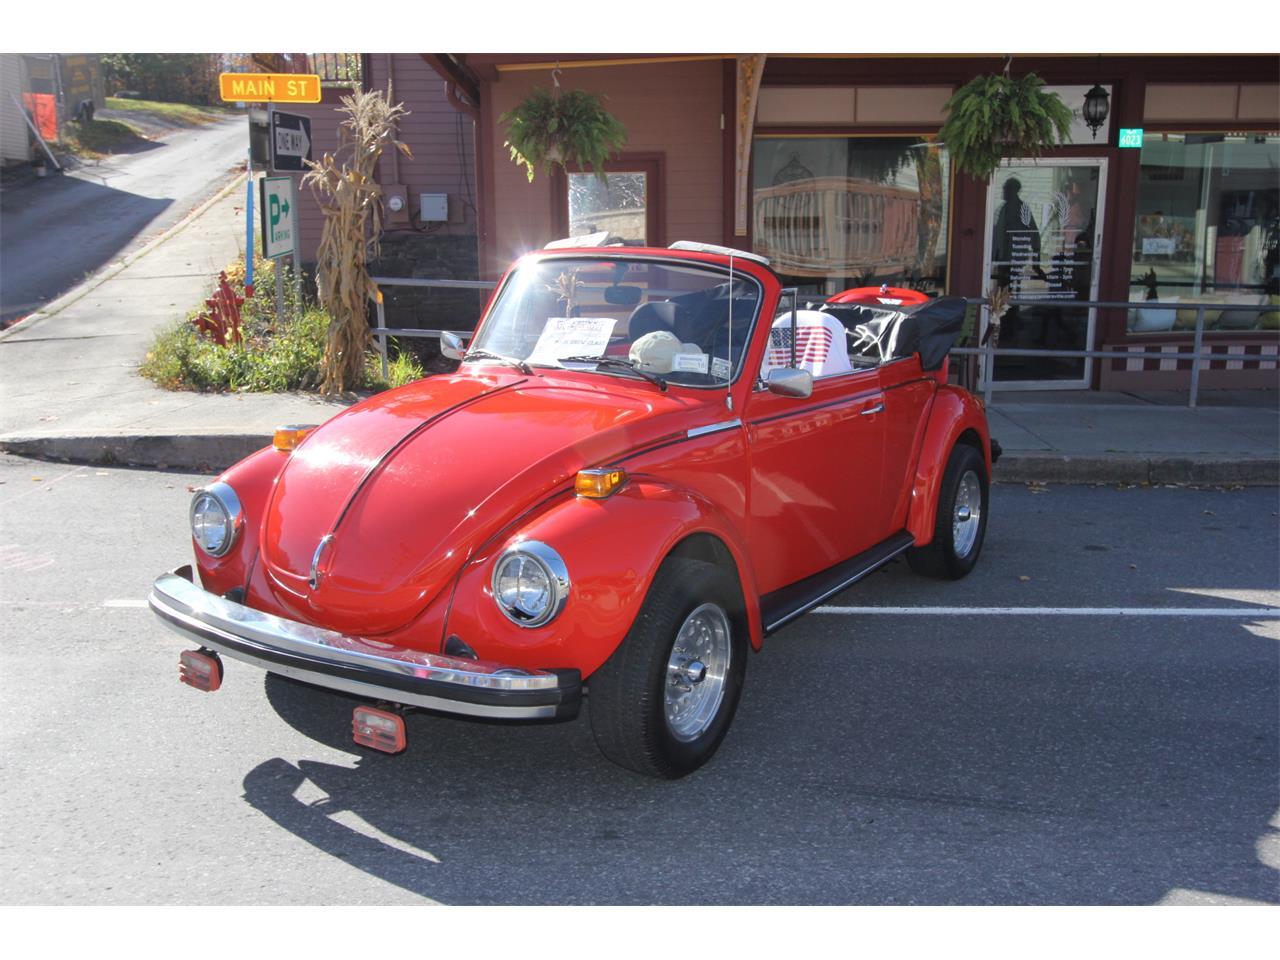 1978 Volkswagen Super Beetle (CC-1137787) for sale in STATEN ISLAND, New York